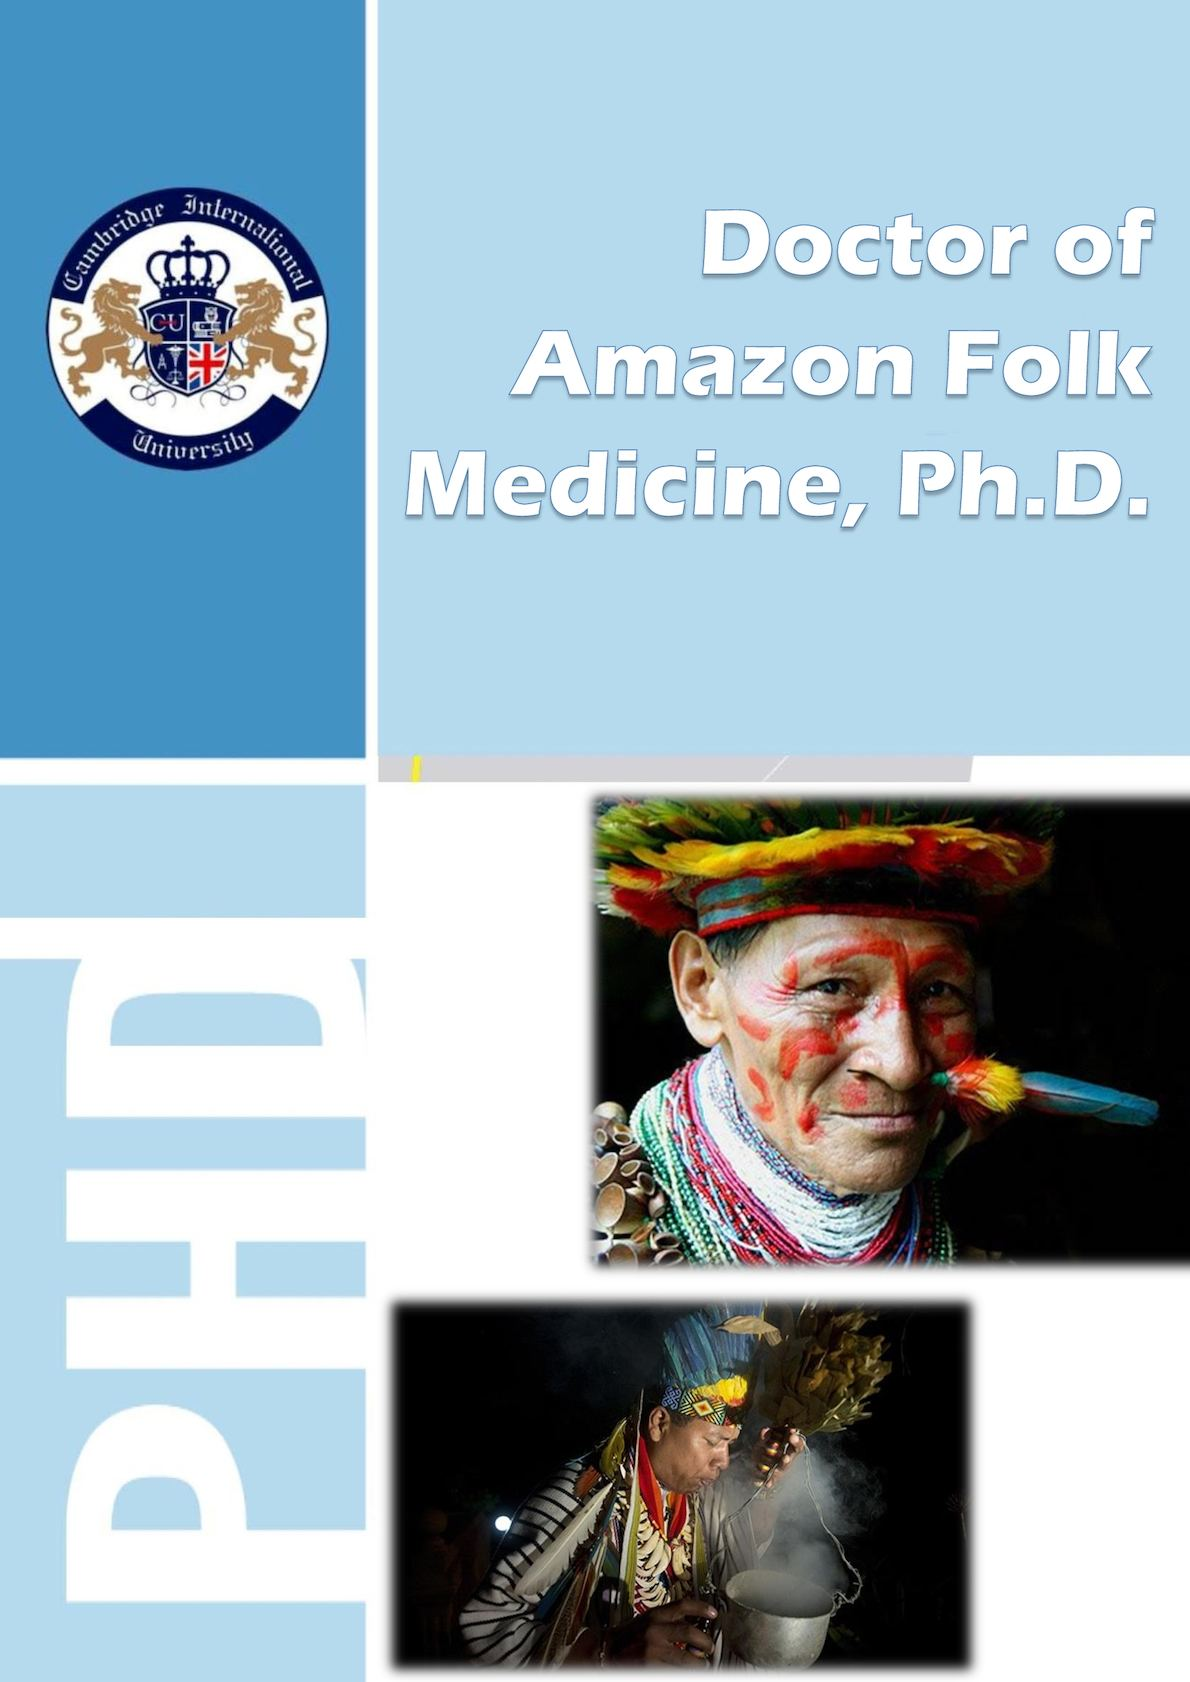 Calaméo - Doctor of Amazon Folk Medicine, Ph.D.